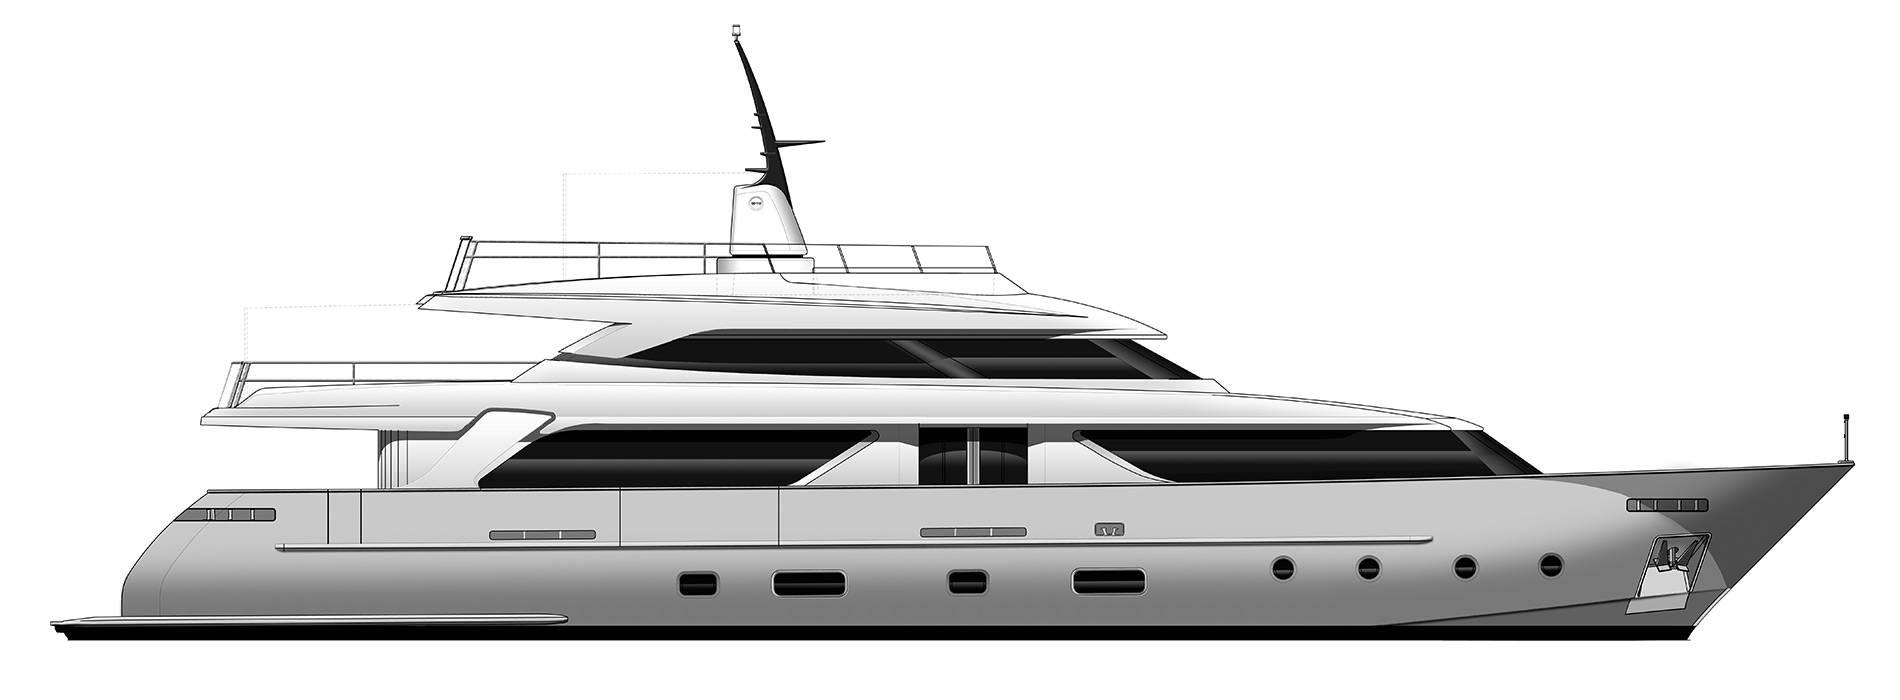 Sanlorenzo Yachts SD112 Профиль